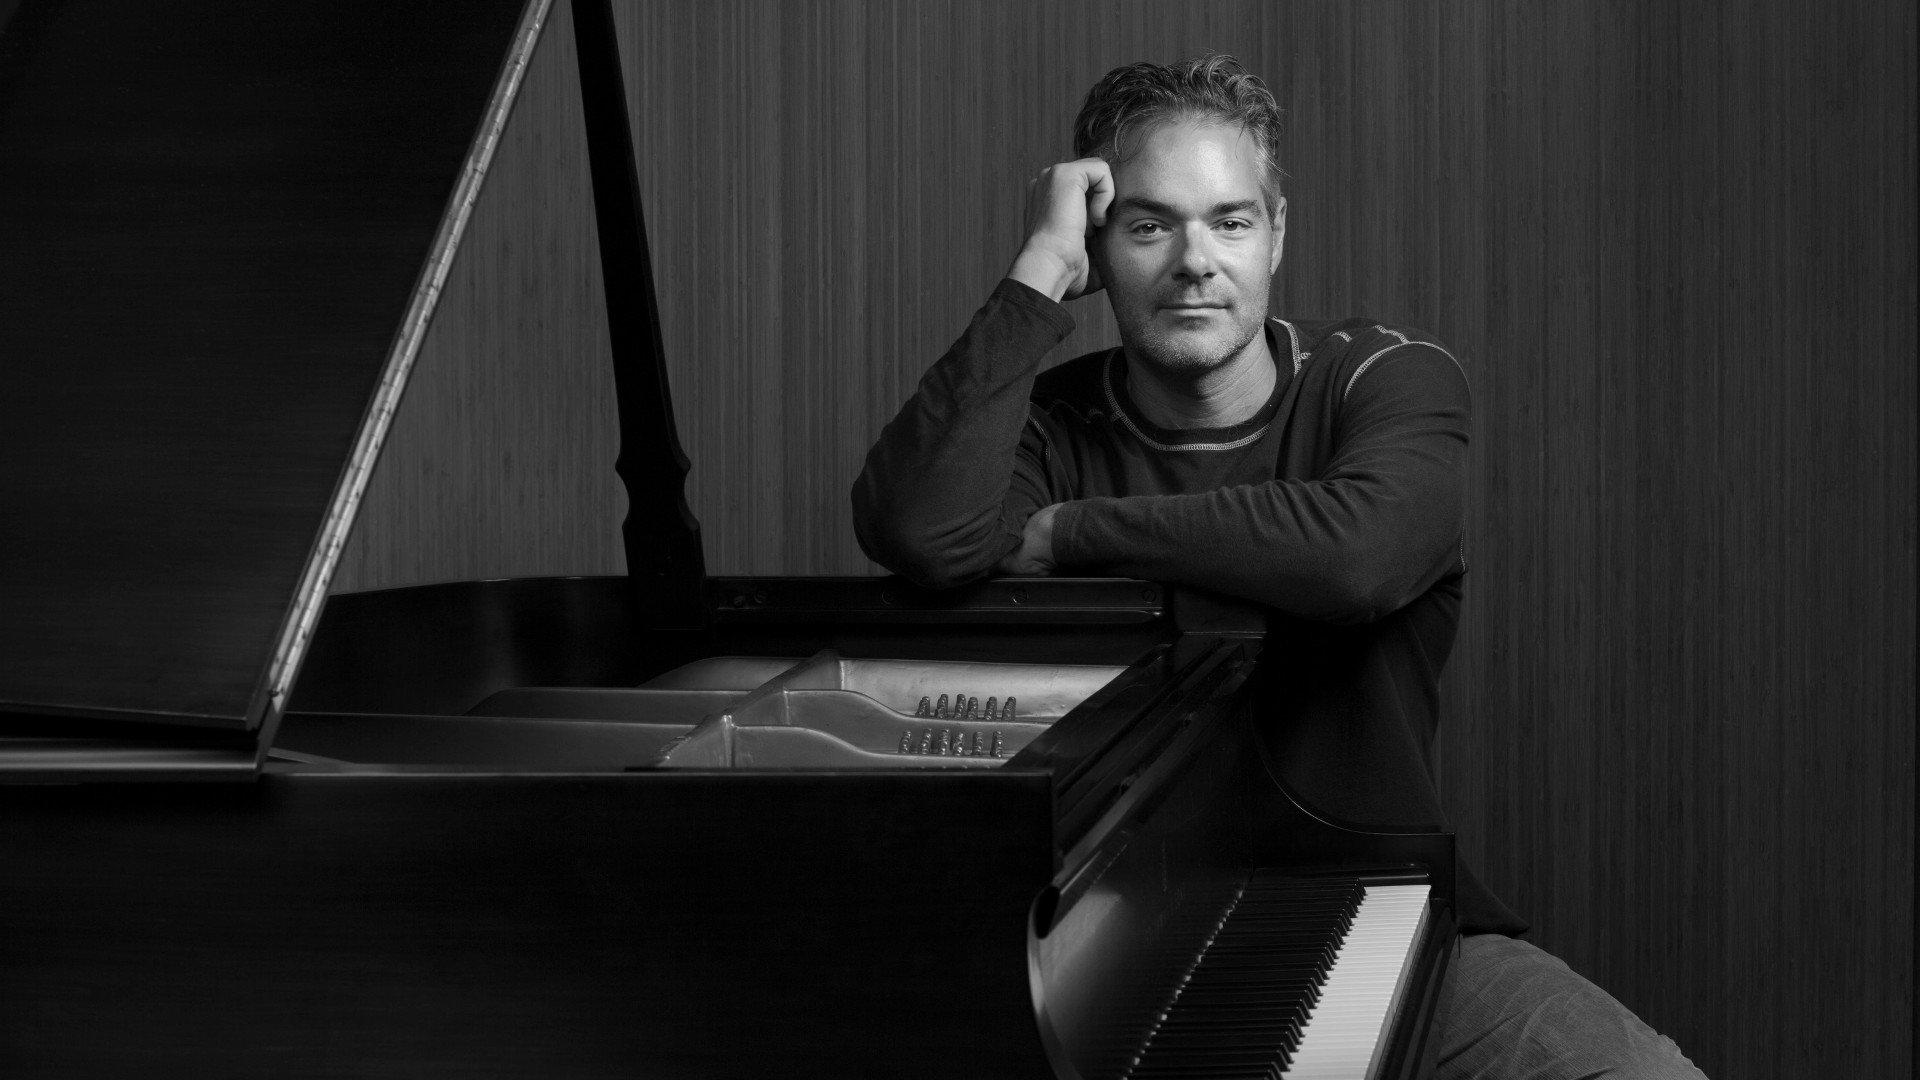 Marco Beltrami - Official Website for the Oscar-nominated Composer